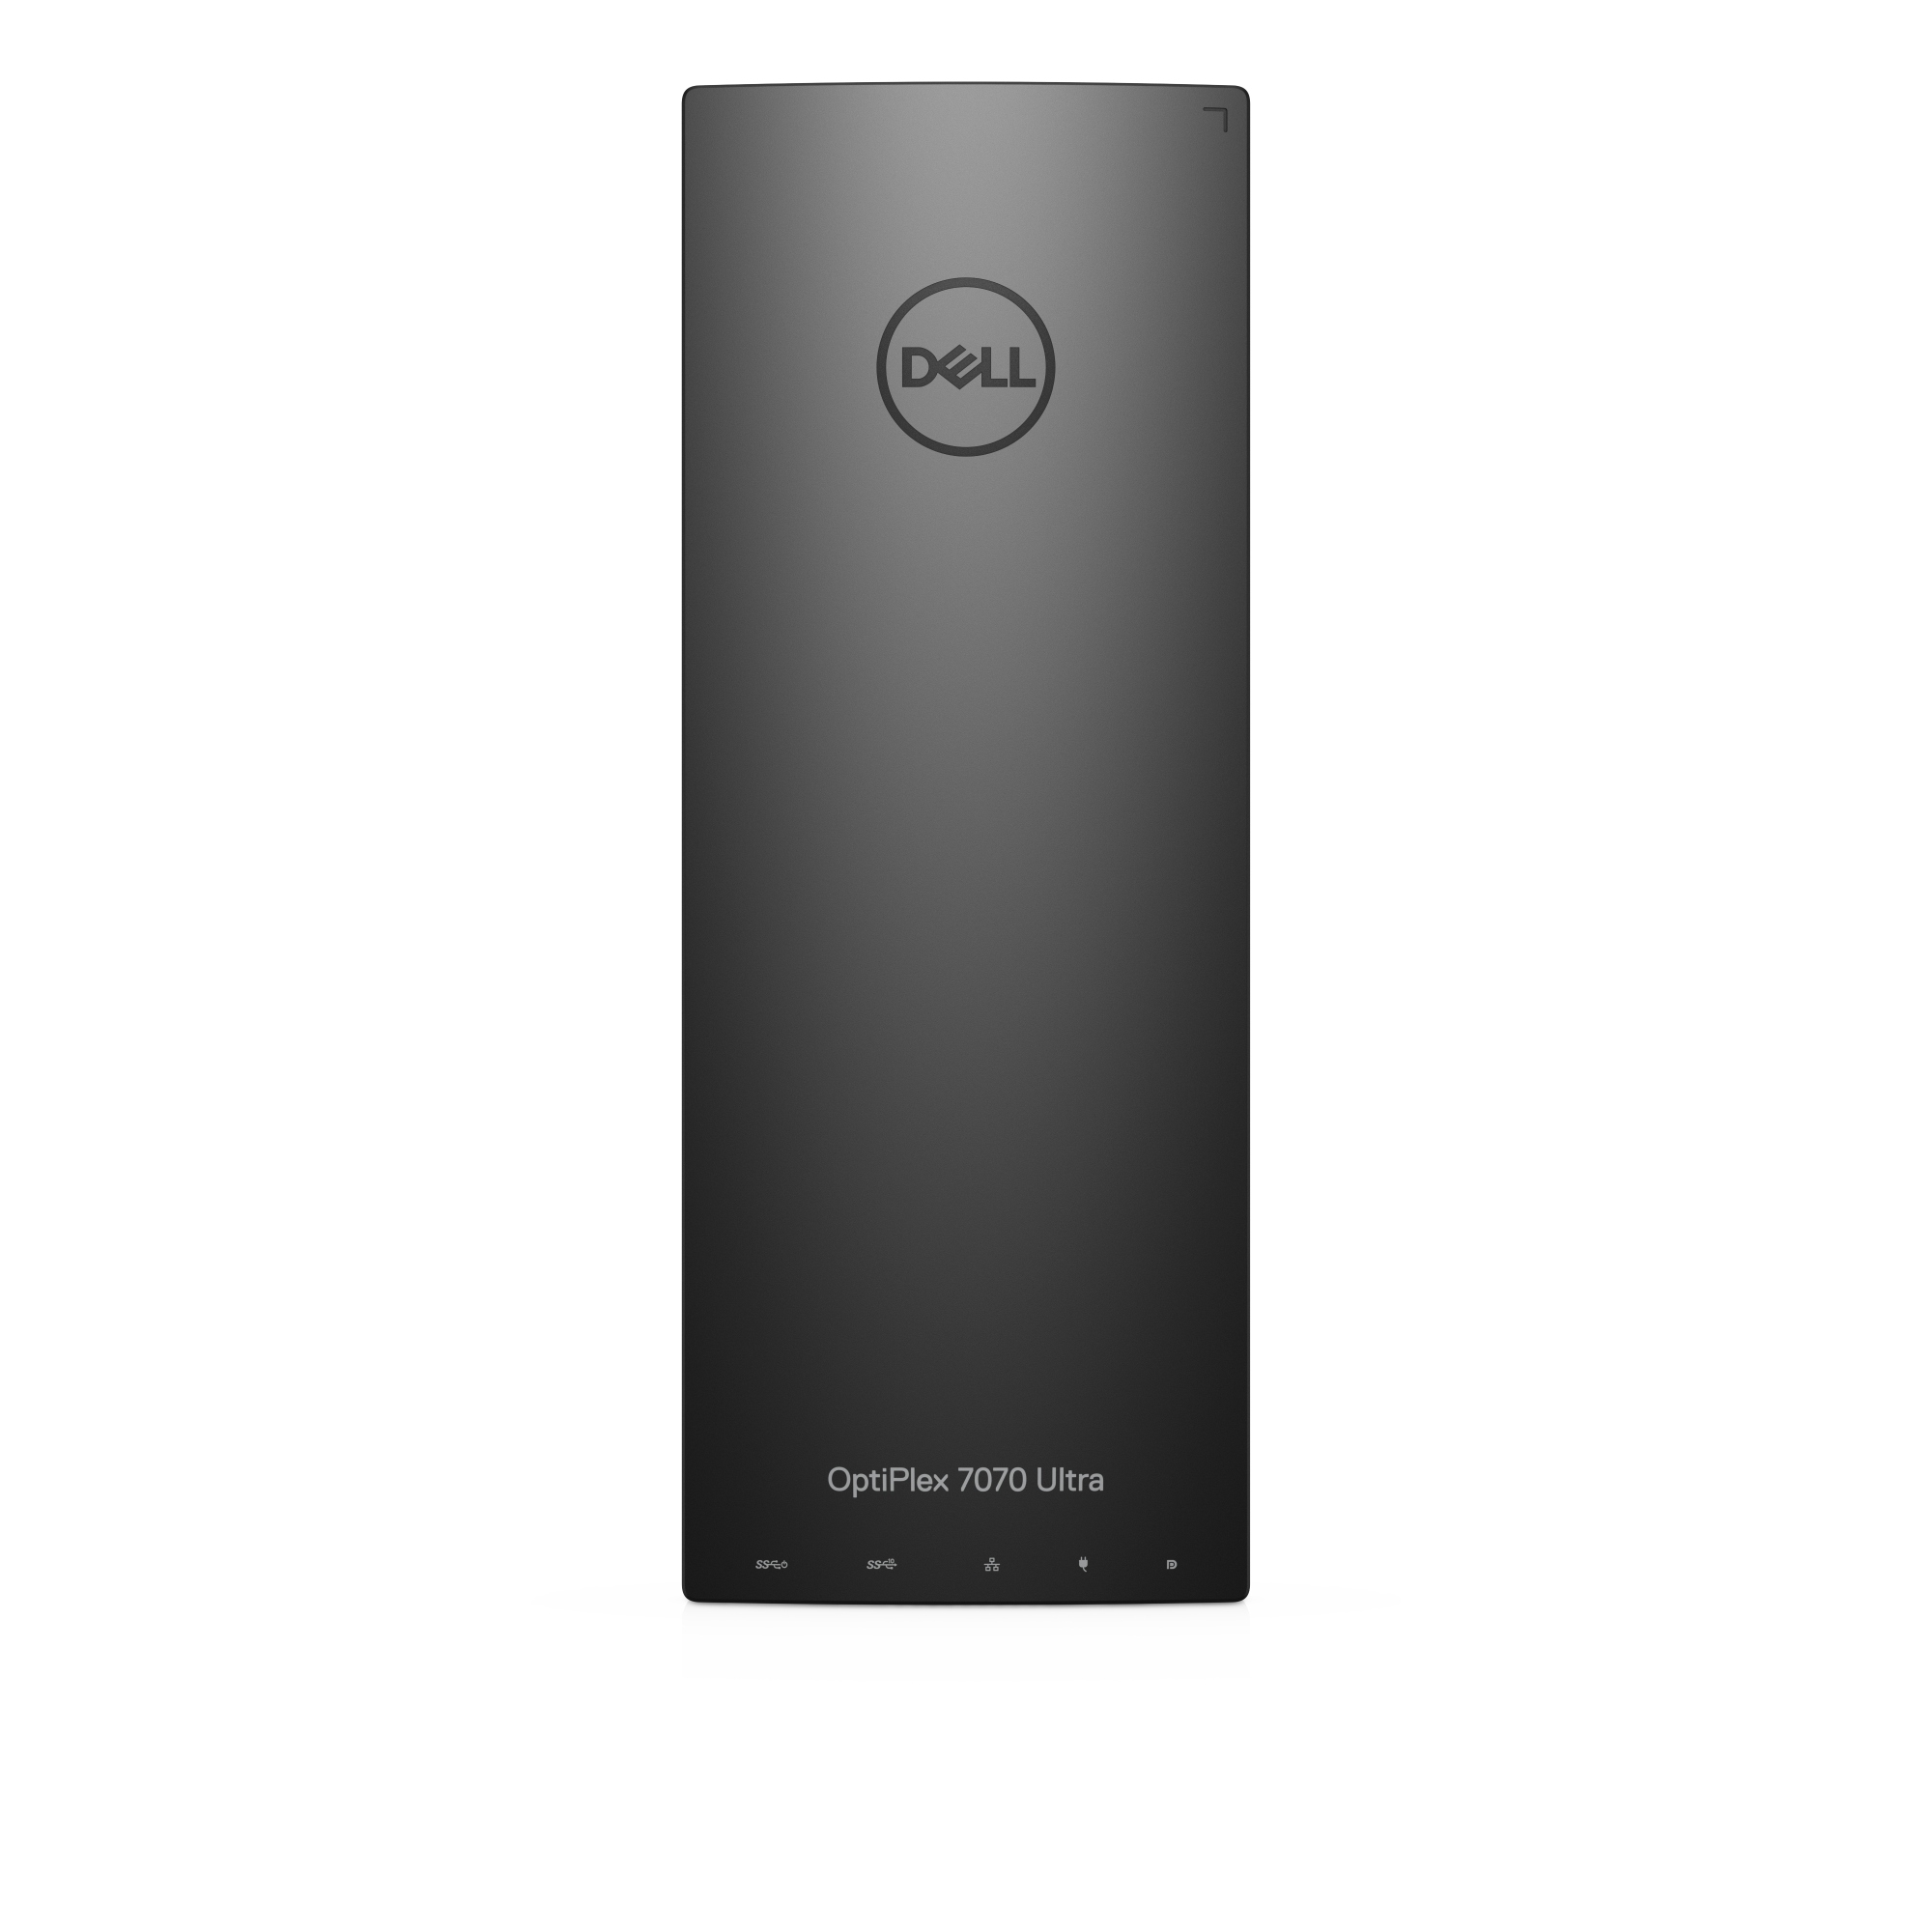 OPTIPLEX 7070 UFF I7-8665U 8ª GENERACIóN DE PROCESADORES INTEL® CORE™ I7 16 GB DDR4-SDRAM 512 GB SSD WINDOWS 10 PRO MINI PC NEGRO